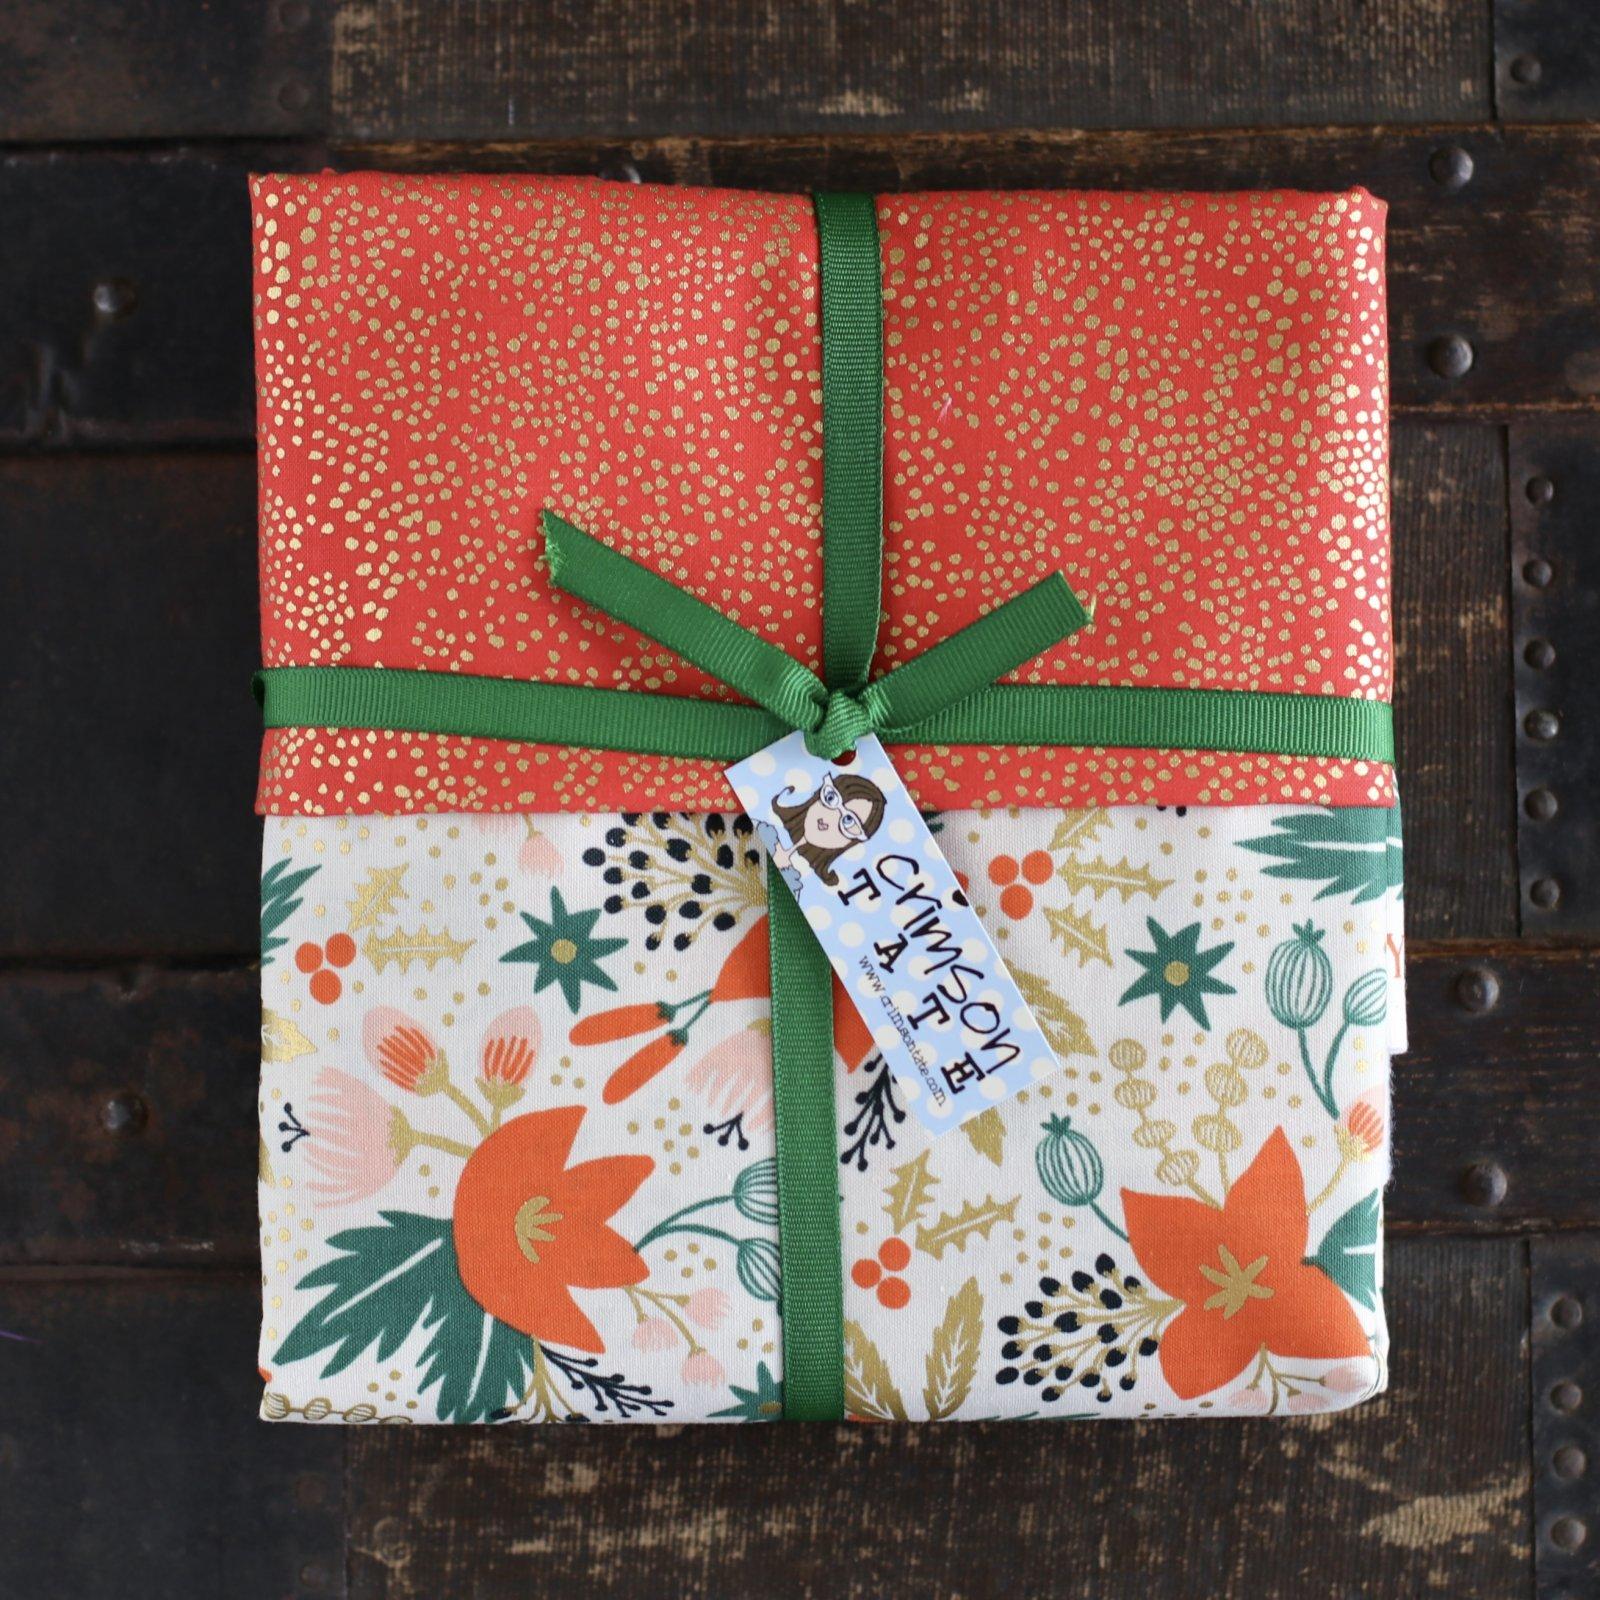 Glitzy Poinsettia Stocking Kit